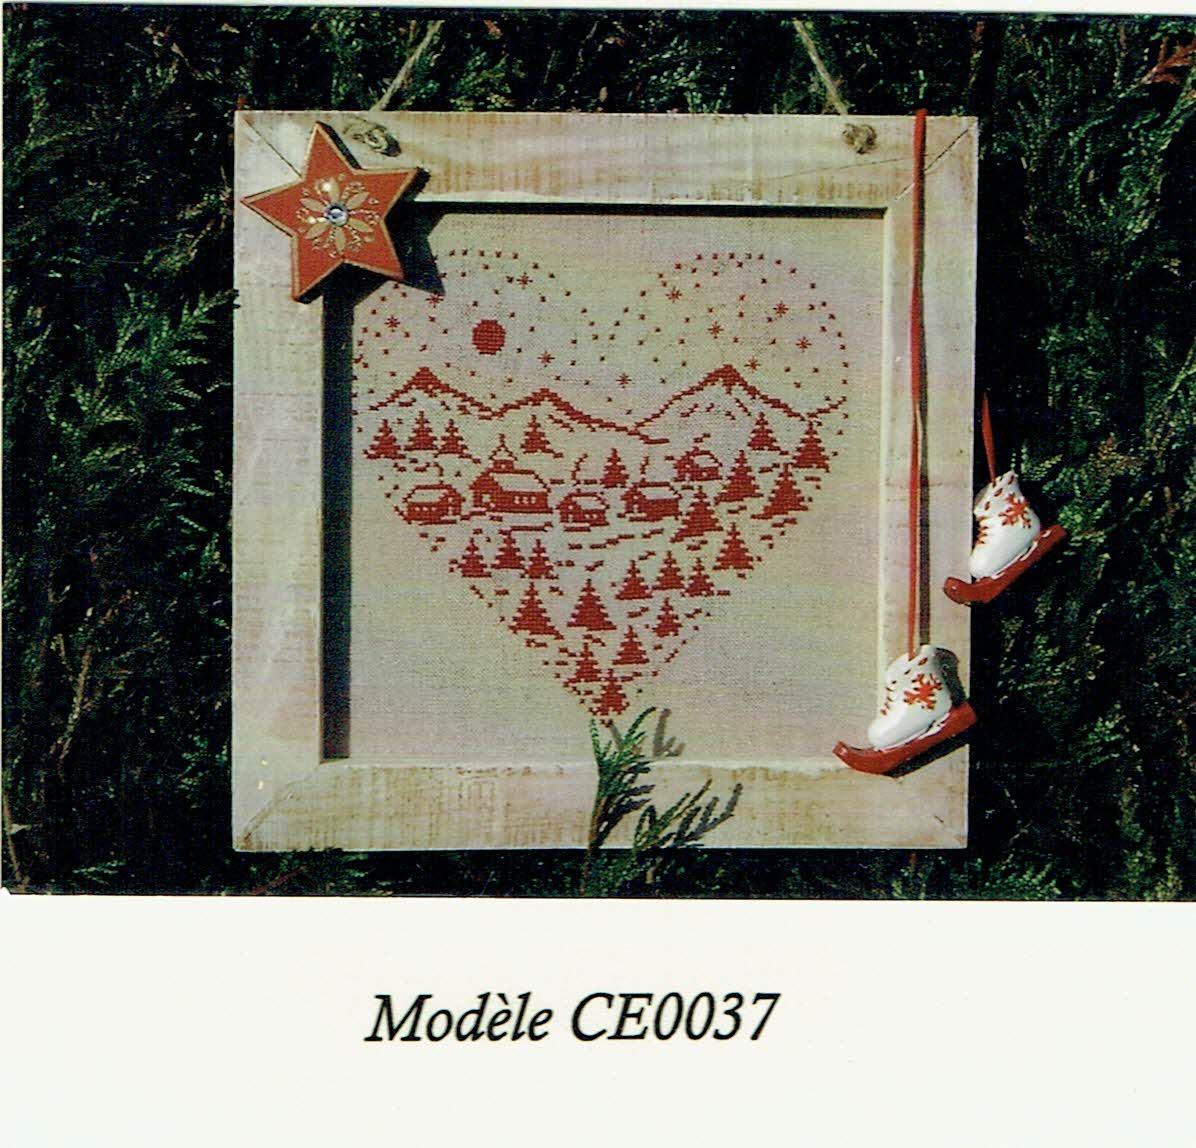 Col - Modell CE0037